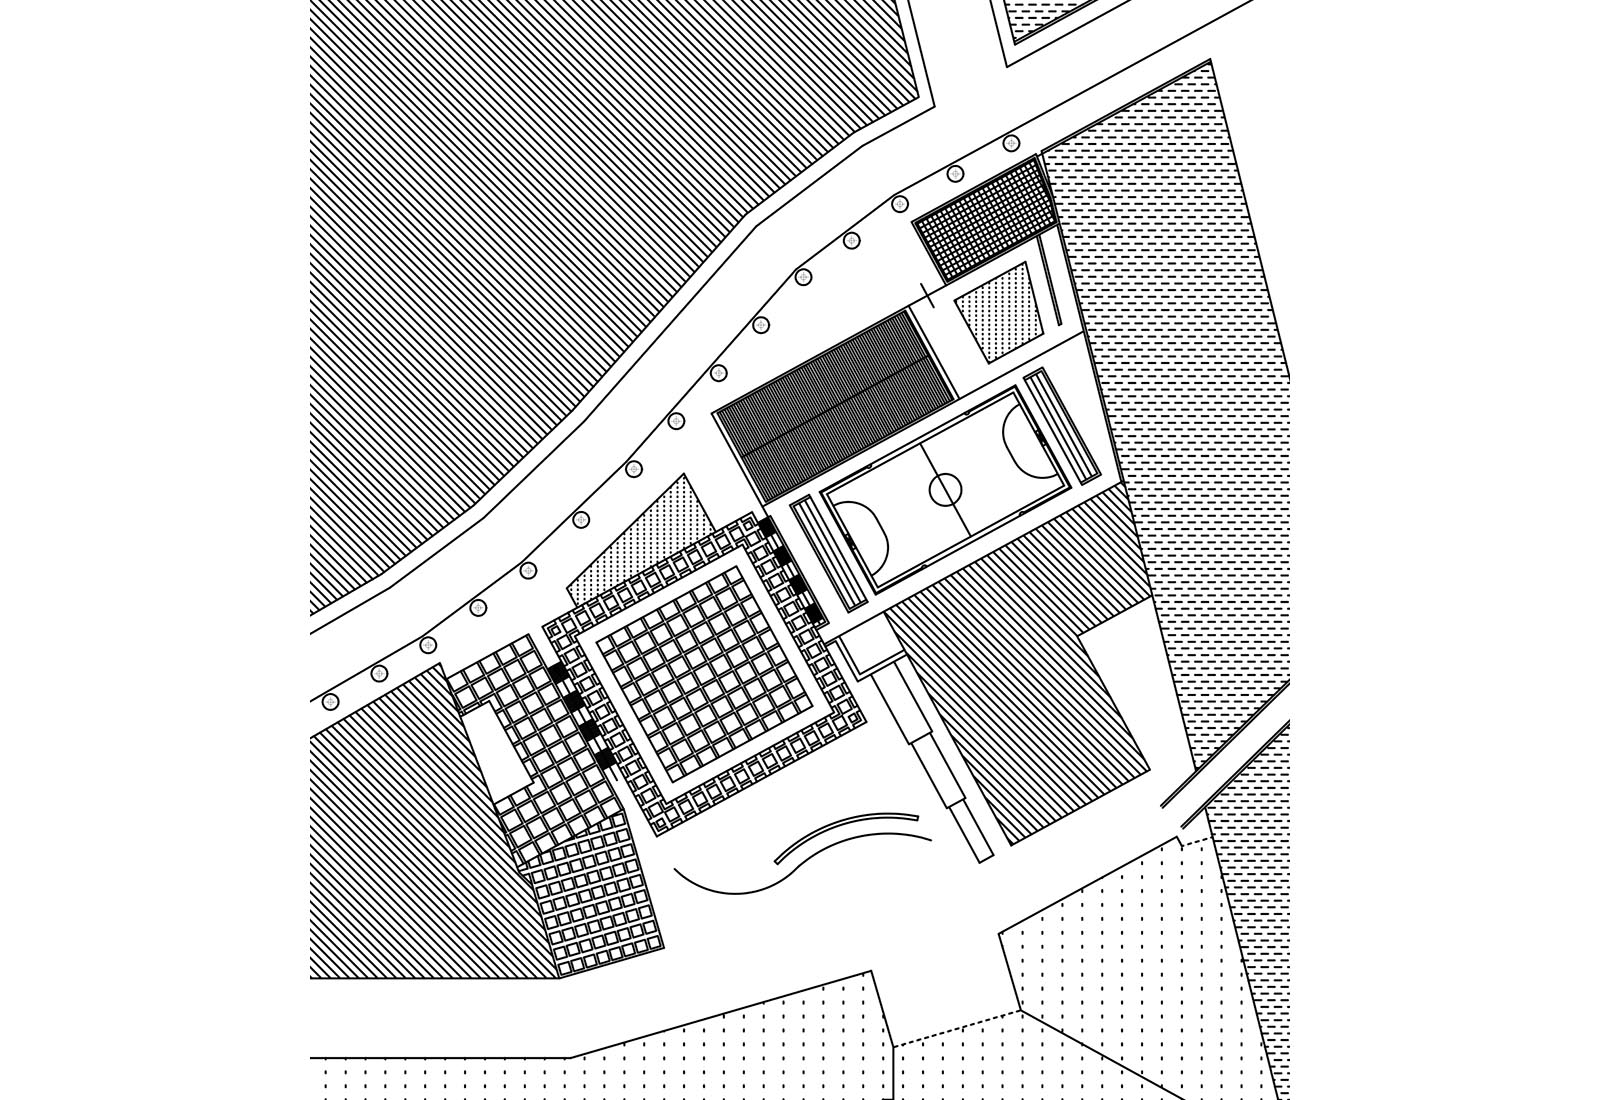 Paesaggi residenziali Savona - La nuova trama urbana